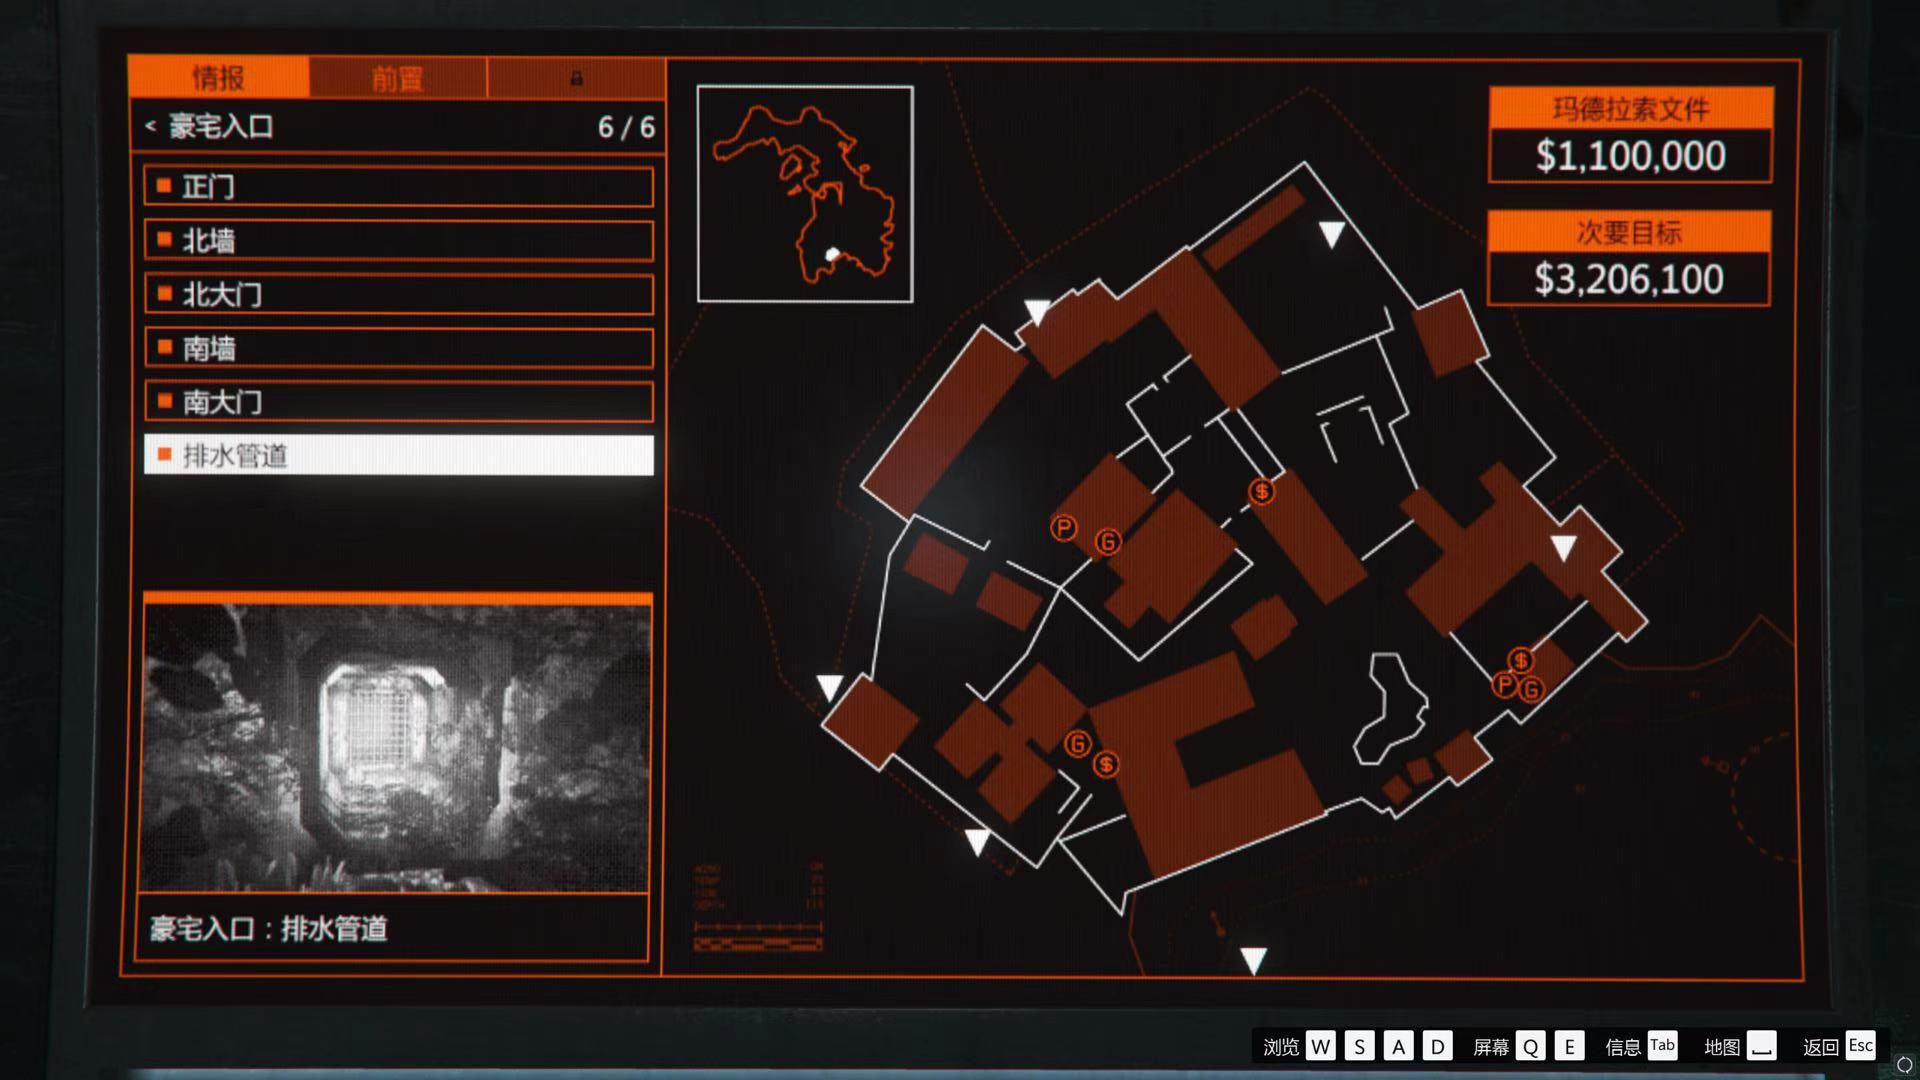 《GTA Online》现已推出:《佩里科岛抢劫任务》